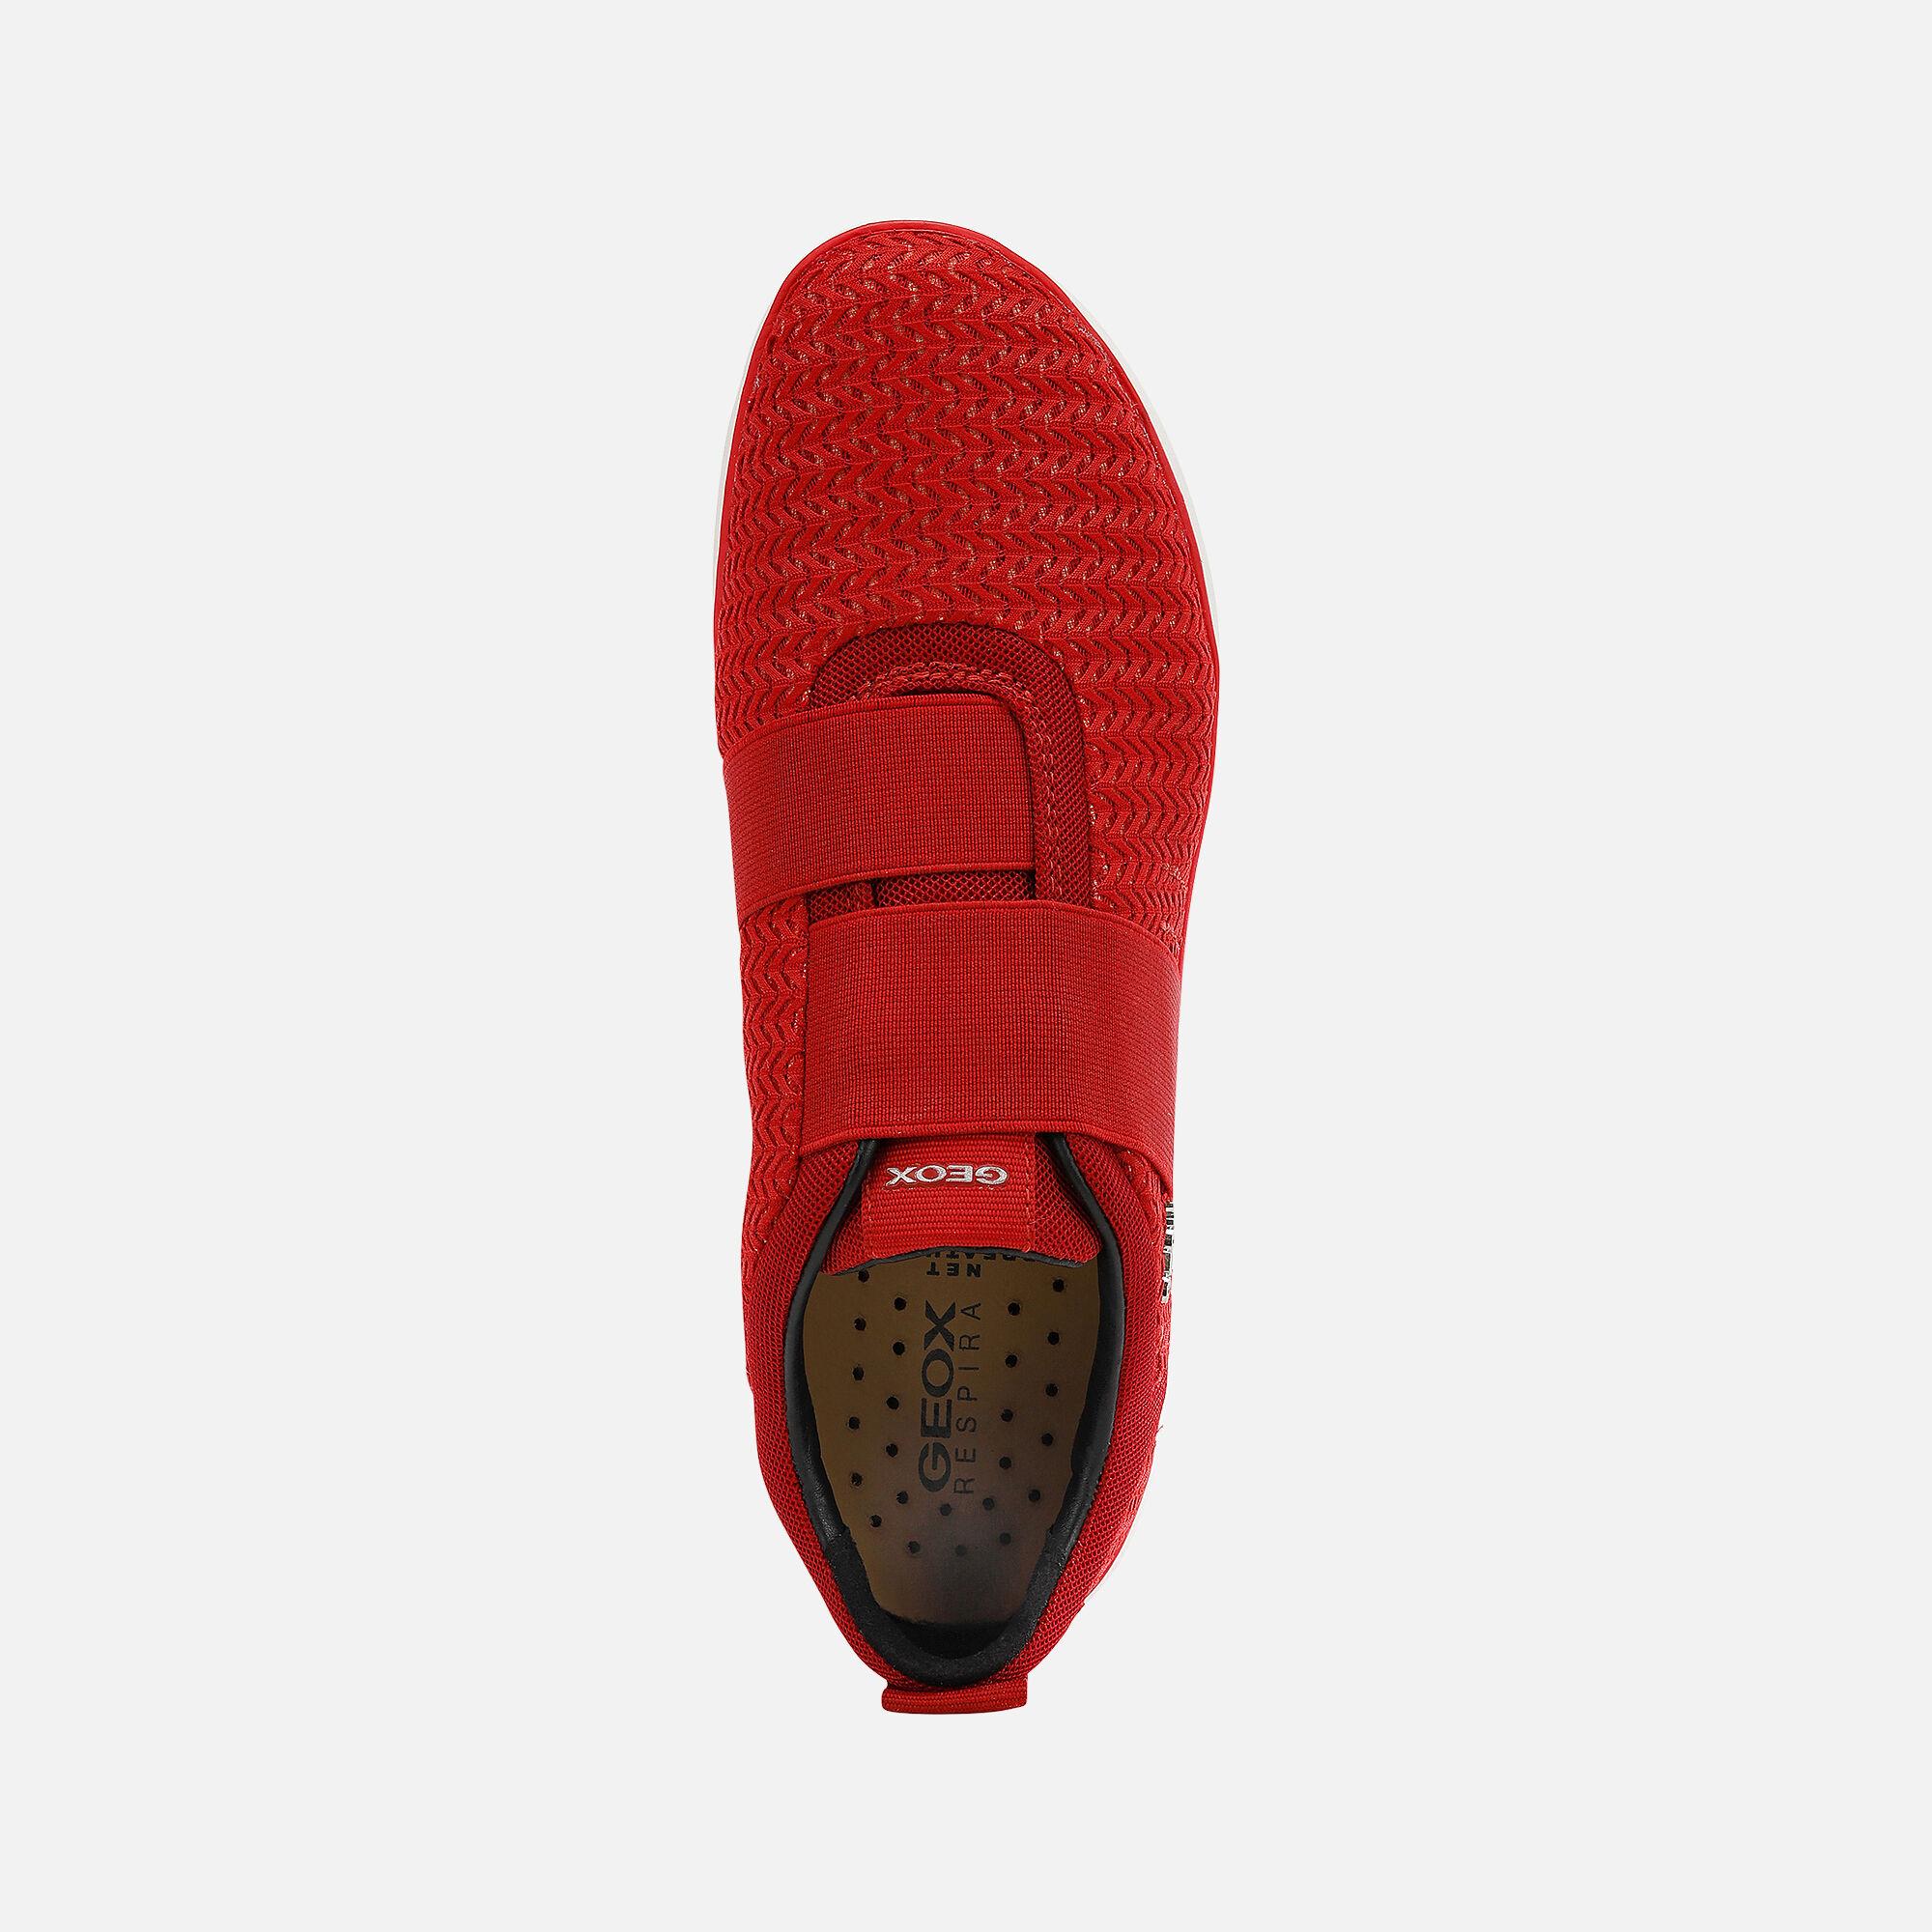 Geox NEBULA Woman: Red Sneakers | Geox